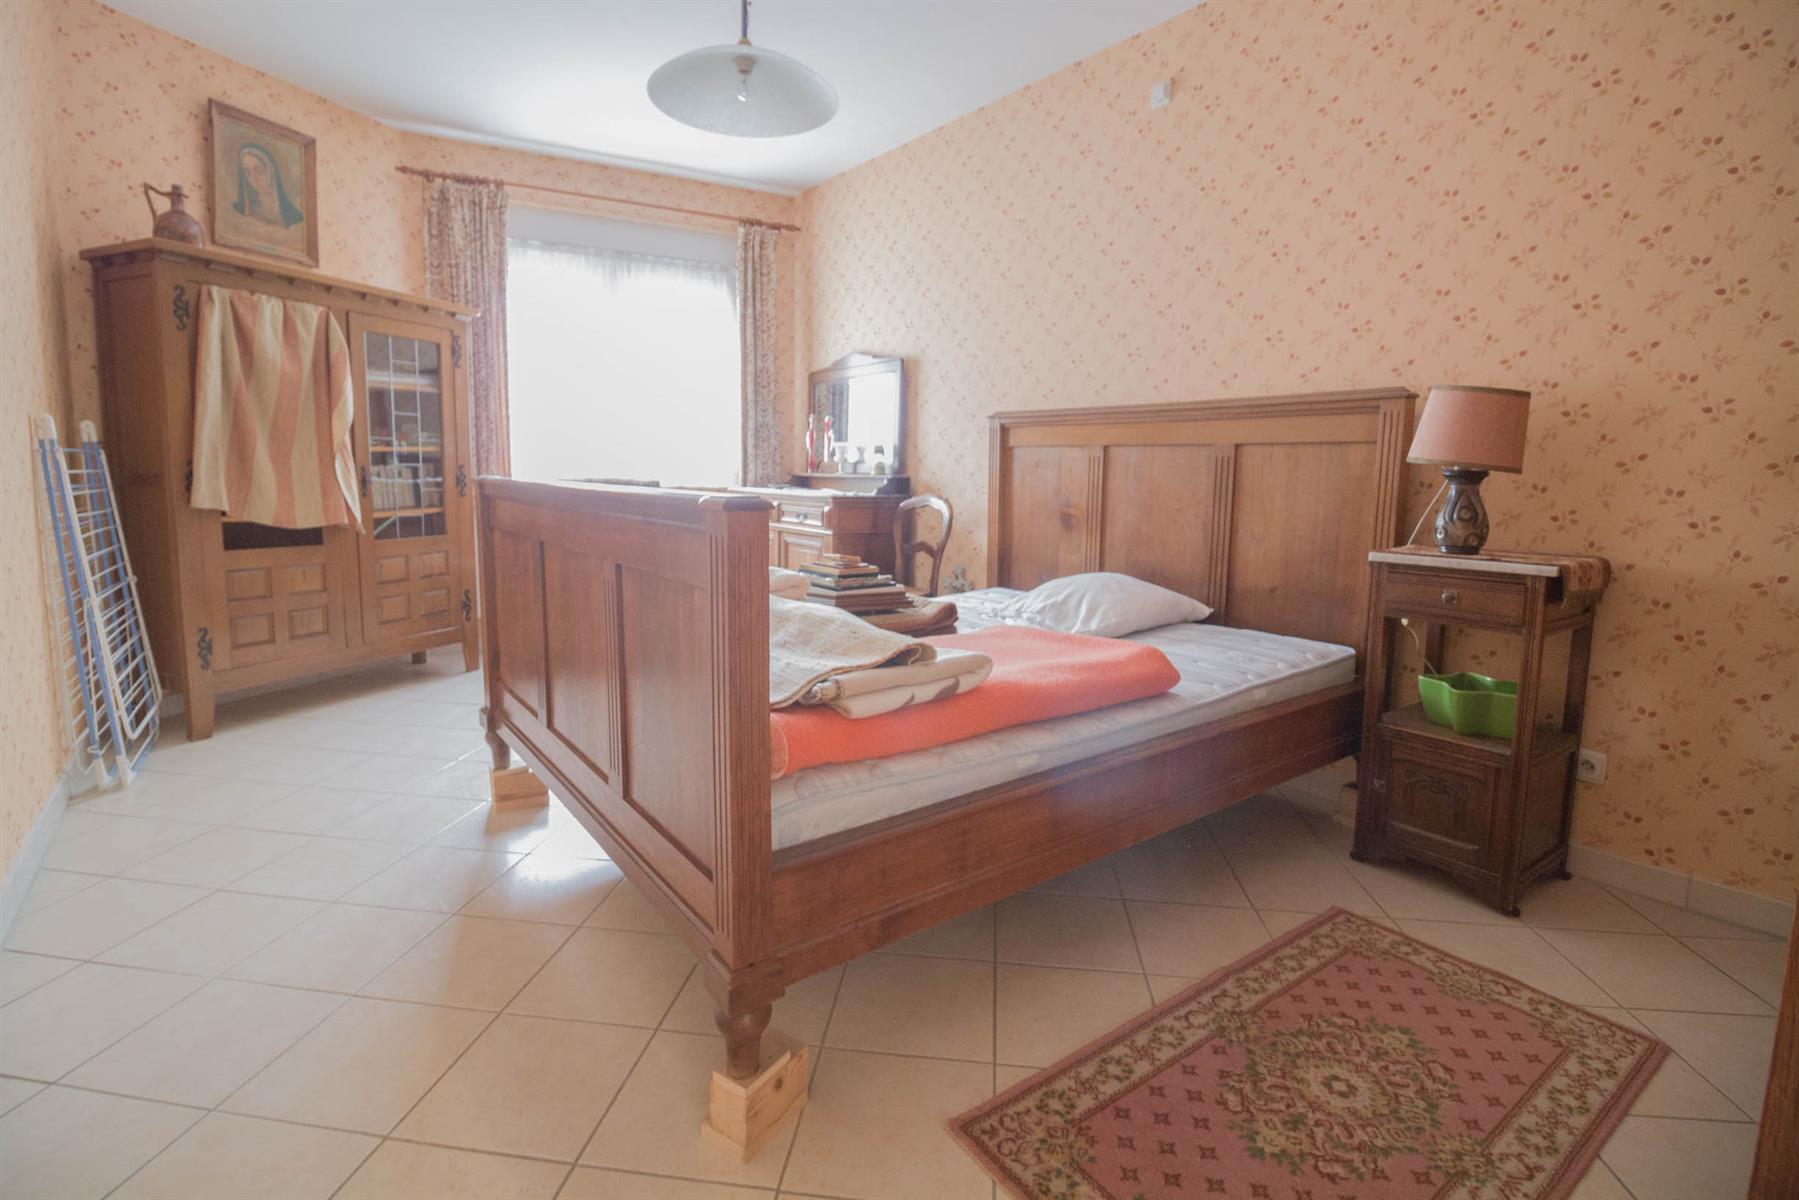 Appartement - Trazegnies - #4359277-15